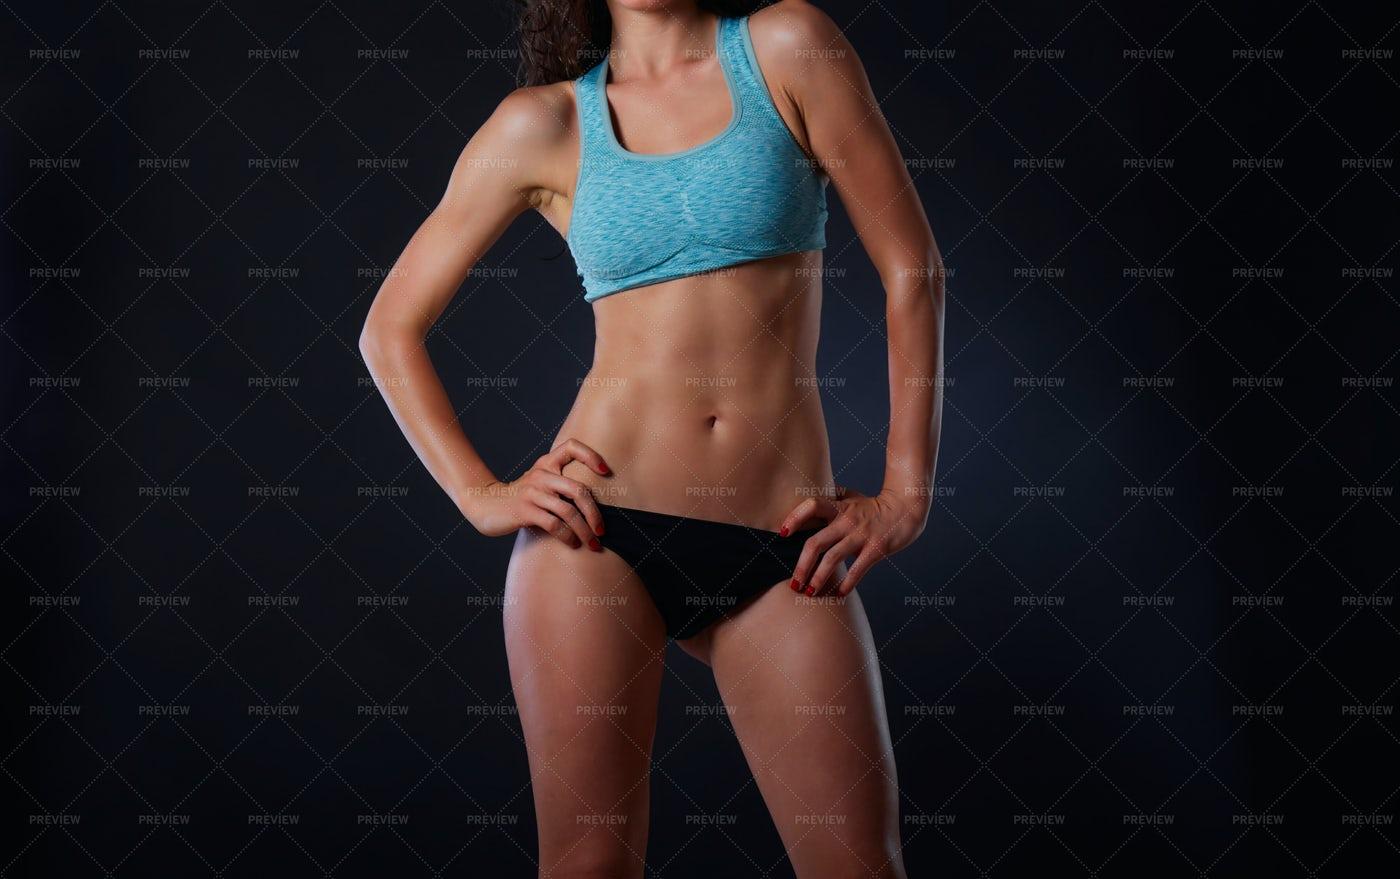 Female Athlete Body Shot: Stock Photos